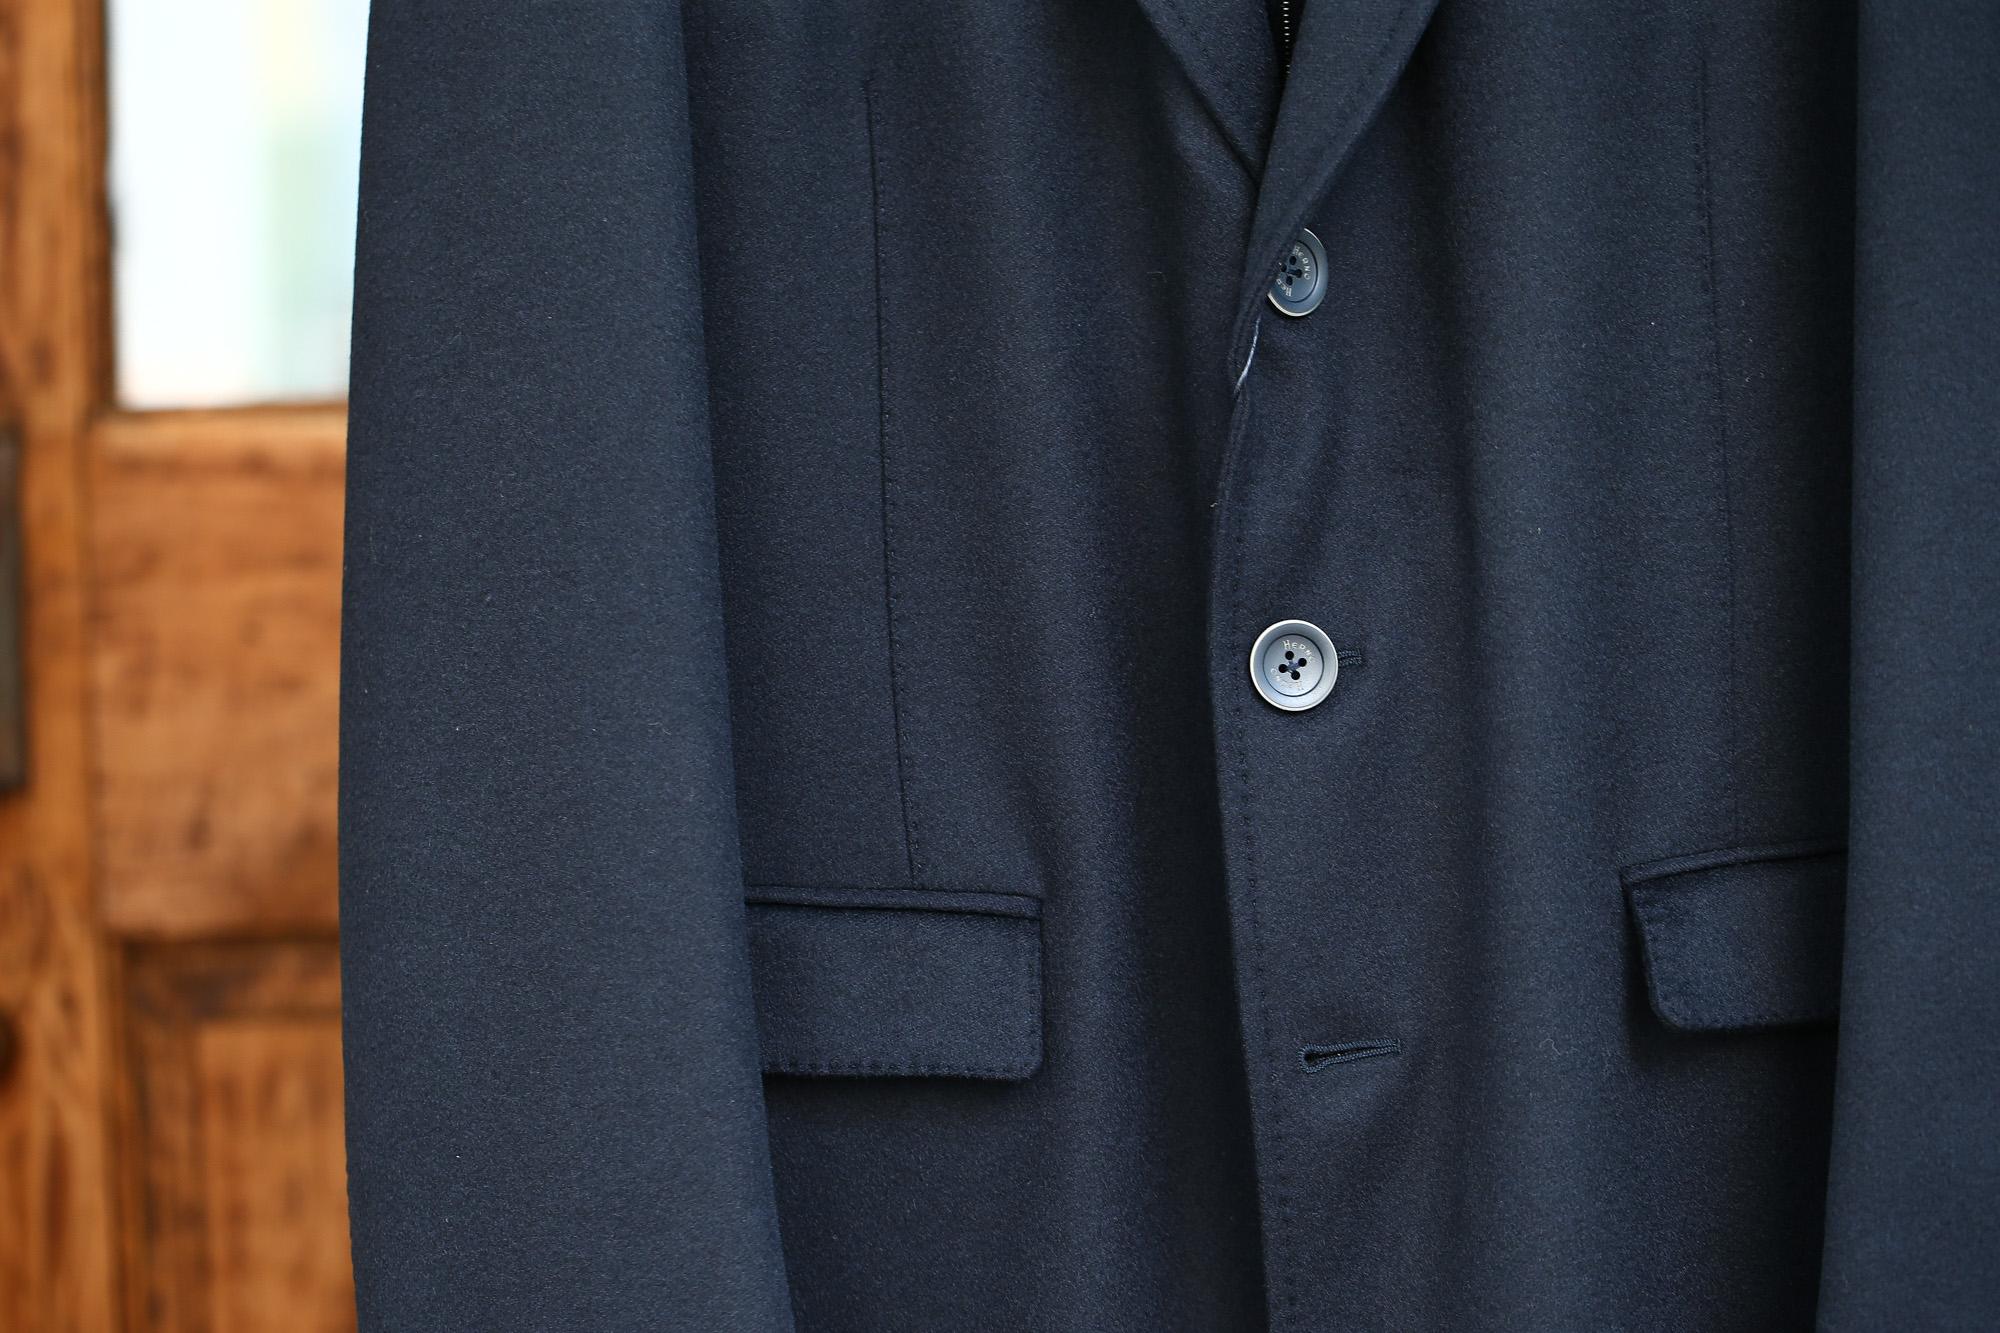 HERNO(ヘルノ) CA0058U Cashmere Chester coat カシミア チェスターコート PIACENZA ピアツェンツァ CASHMERE DROPGLIDE NYLON ULTRALIGHT 中綿入り カシミア チェスターコート NAVY (ネイビー・9200) Made in italy (イタリア製) 2017 秋冬新作 愛知 名古屋 ZODIAC ゾディアック herno ヘルノ ダウンコート ビジネススタイル